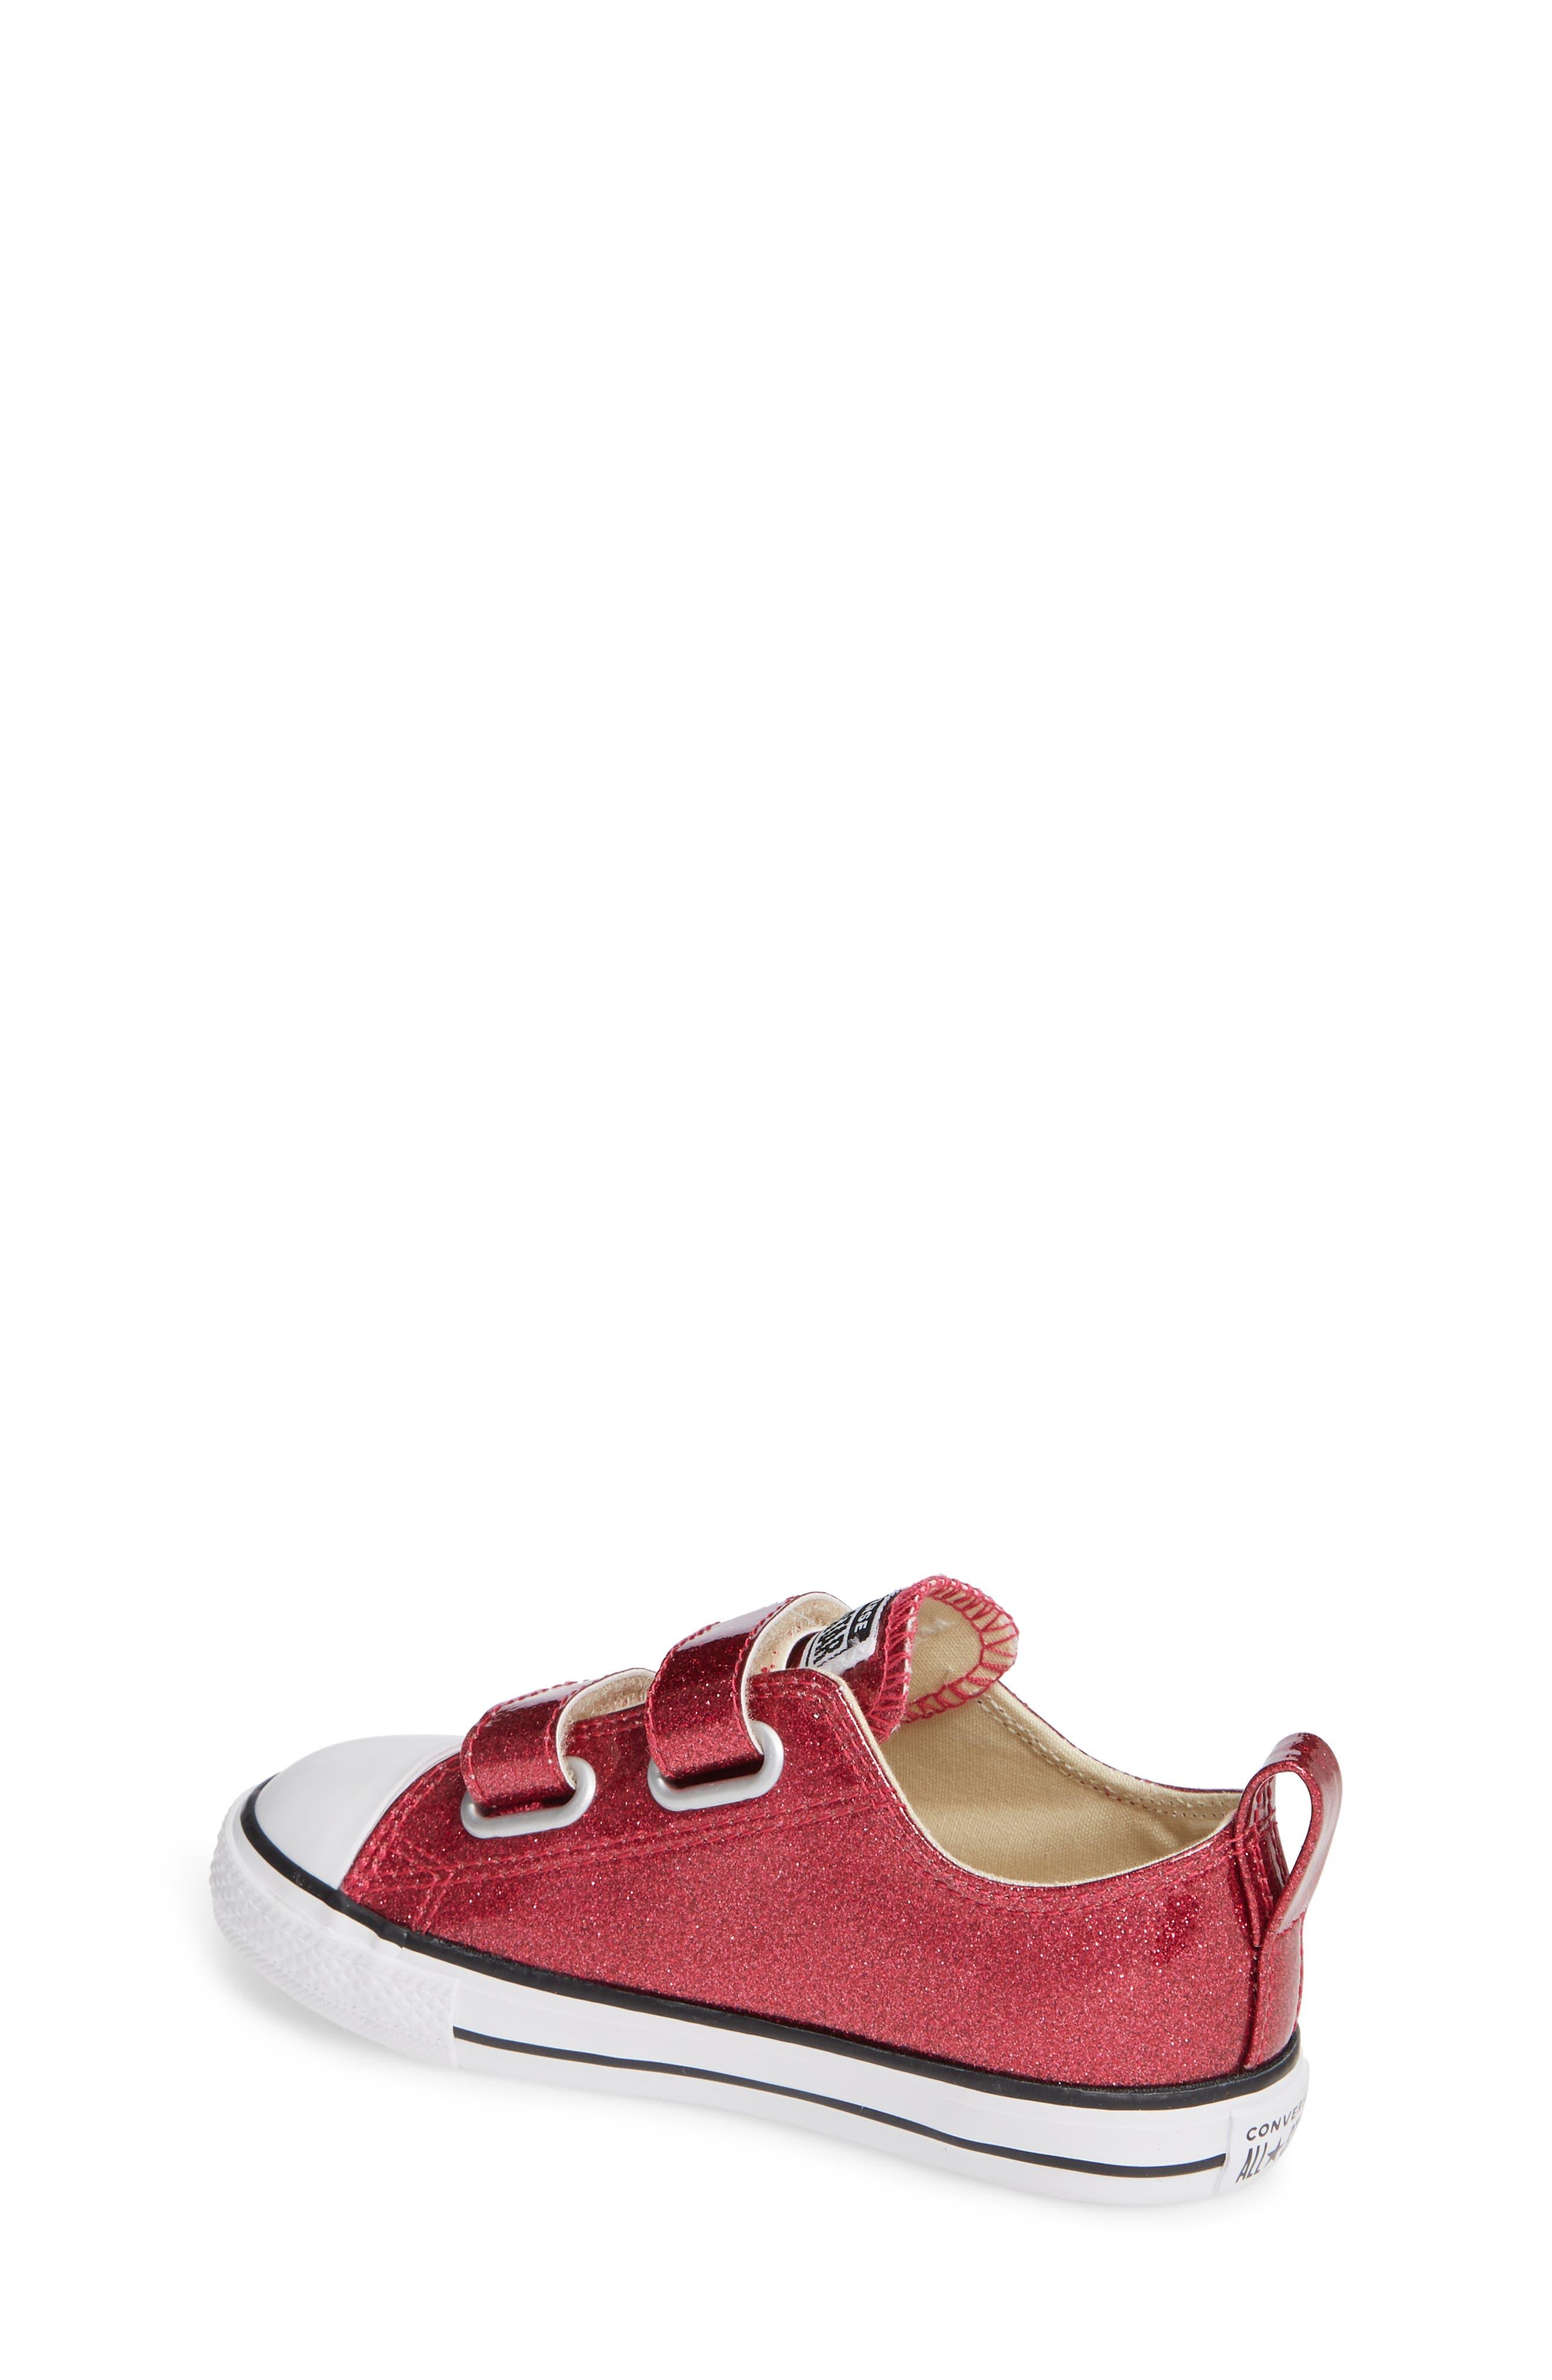 All Star<sup>®</sup> Seasonal Glitter Sneaker,                             Alternate thumbnail 2, color,                             Pink Pop